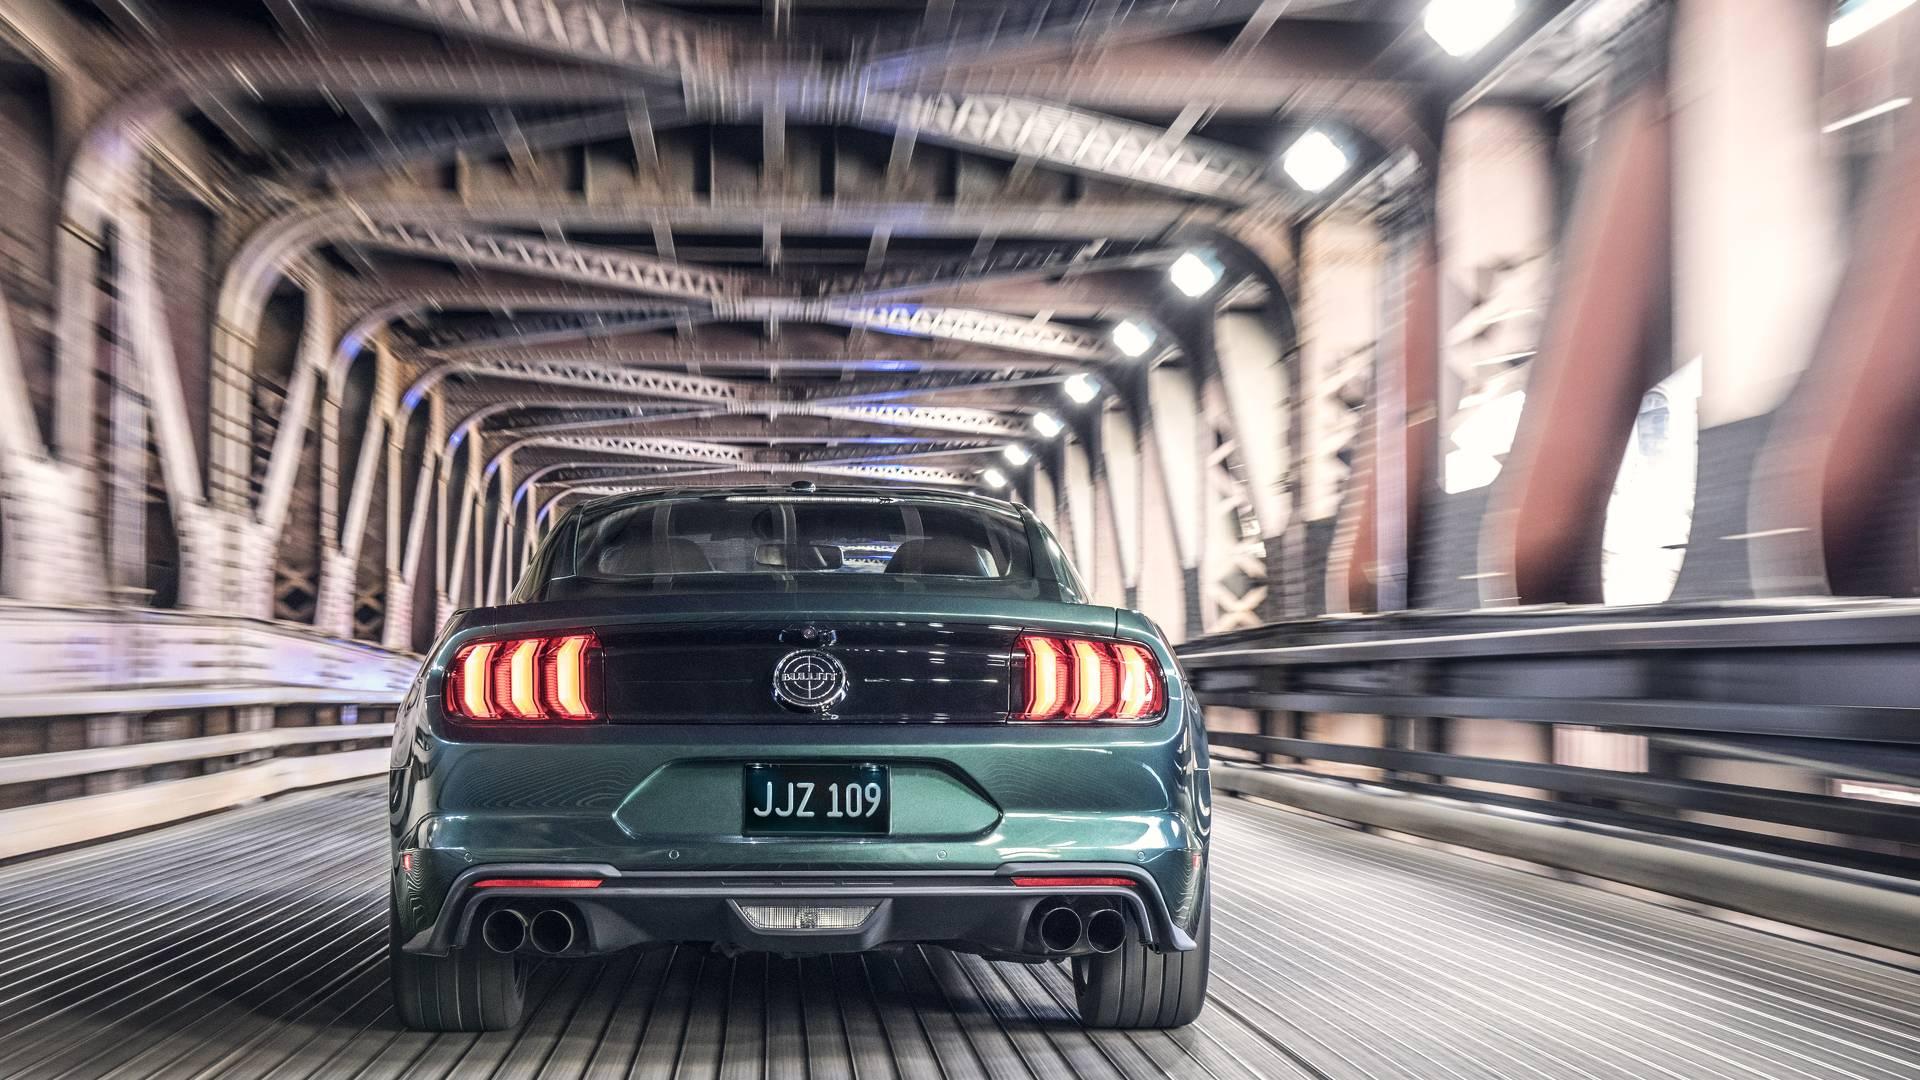 2019 ford mustang bullitt special edition msrp set at 46595